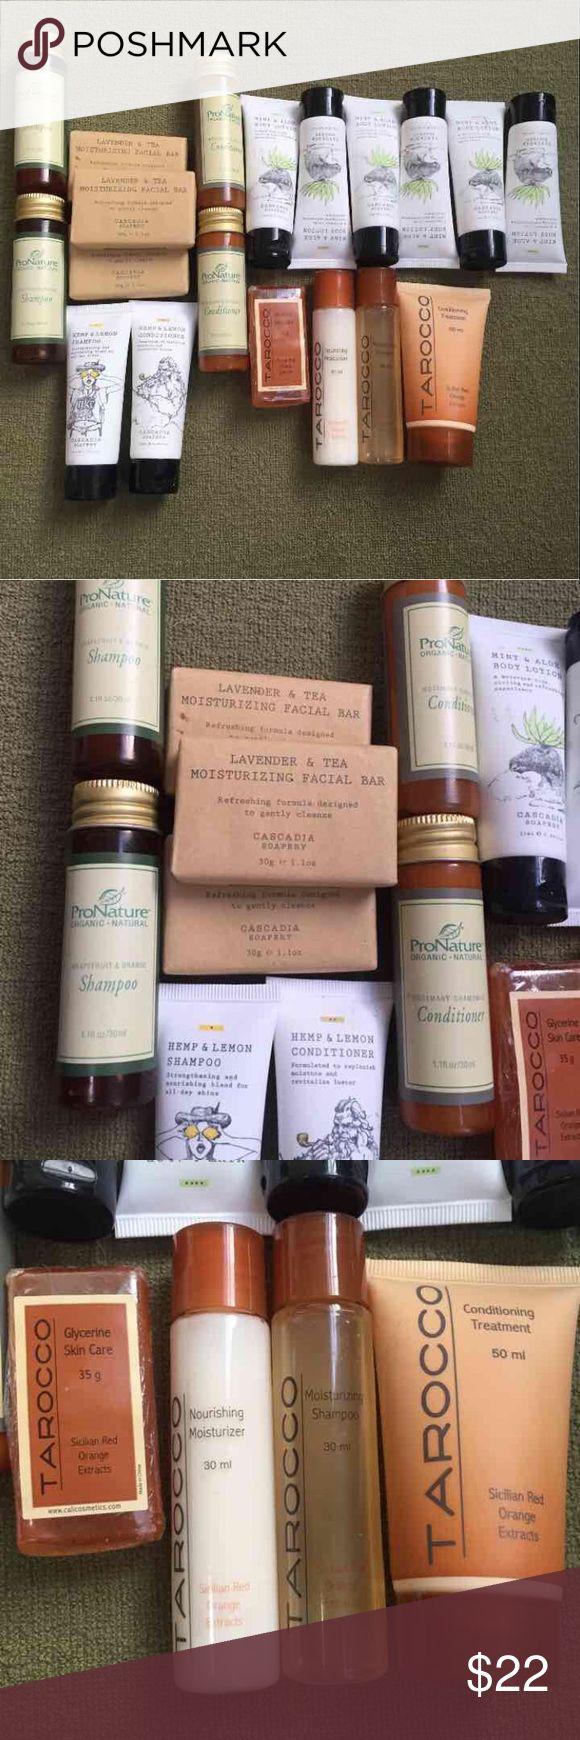 Body samples 20 •ProNature Organic Shampoo and conditioner - 2 each  lemon verbena body bar soap (not shown) •Tarocco conditioning, shampoo and soap •Cascadia mint & aloe body lotion  (6), hemp & lemon shampoo & conditioner and 3 lavender bar facial soaps Makeup